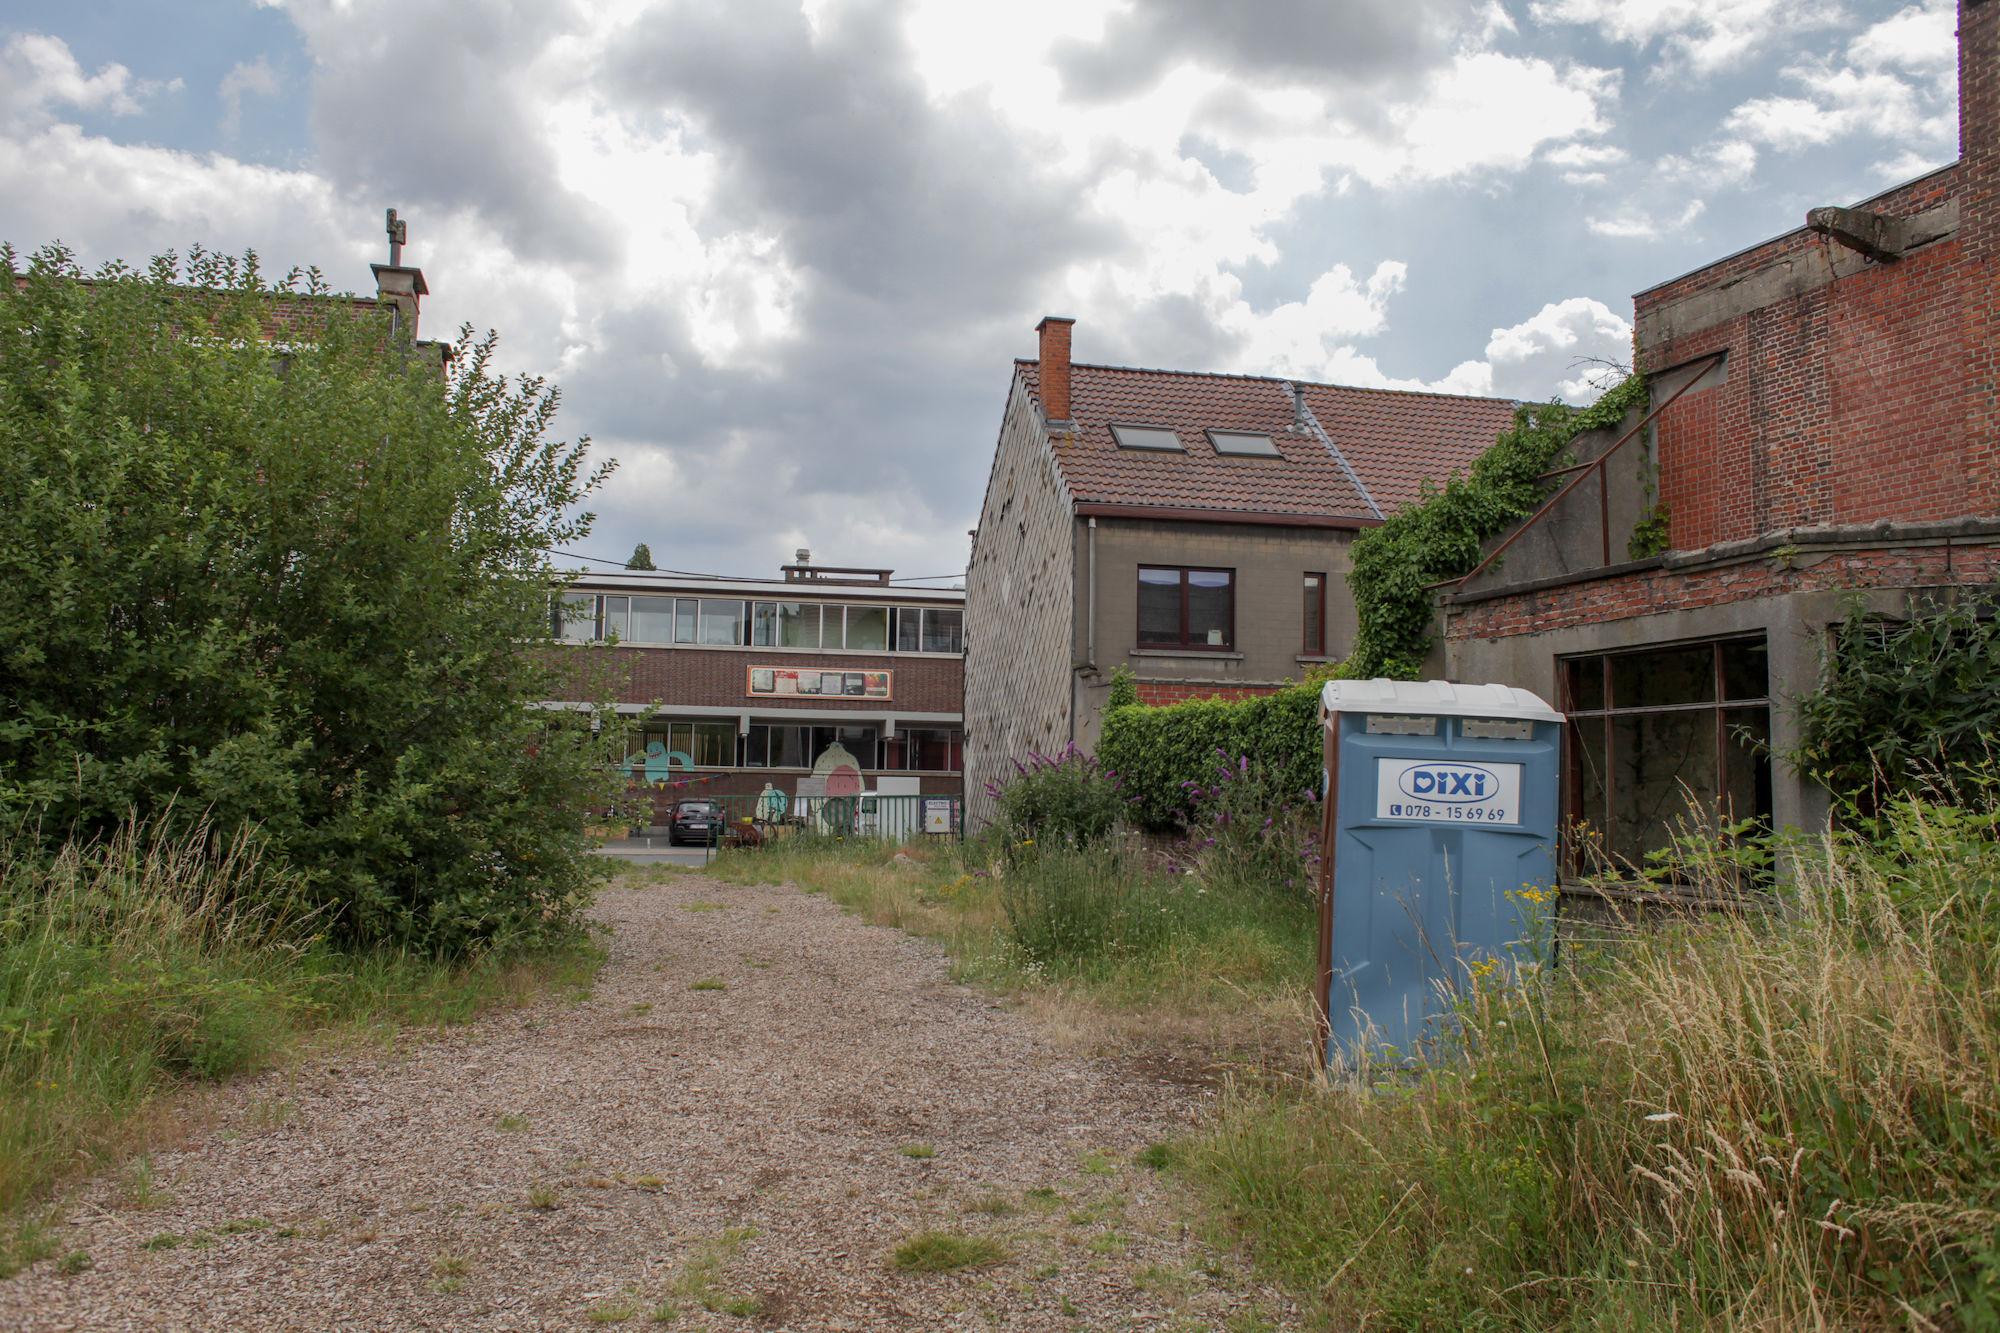 2019-07-02 Muide Meulestede prospectie Wannes_stadsvernieuwing_IMG_0333-2.jpg